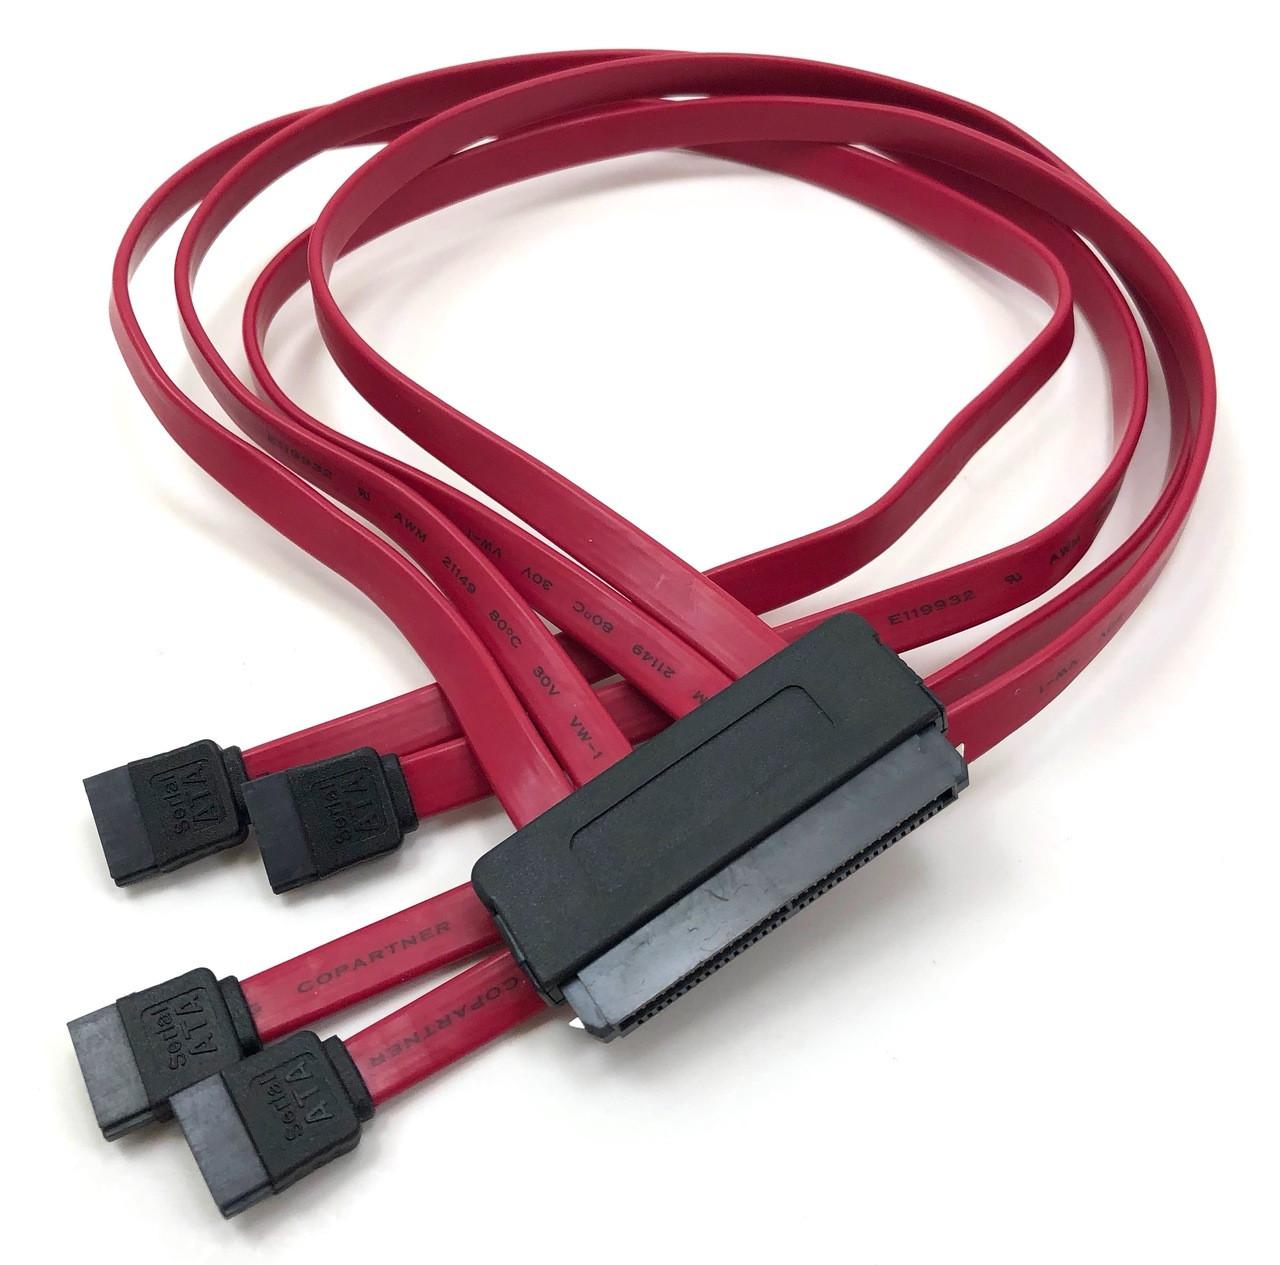 SAS Controller to SAS /SATA Backplane and SATA Disk Drive Cable (SFF-8484 to SATA (4) X 1). SATA III (6Gb) compliant